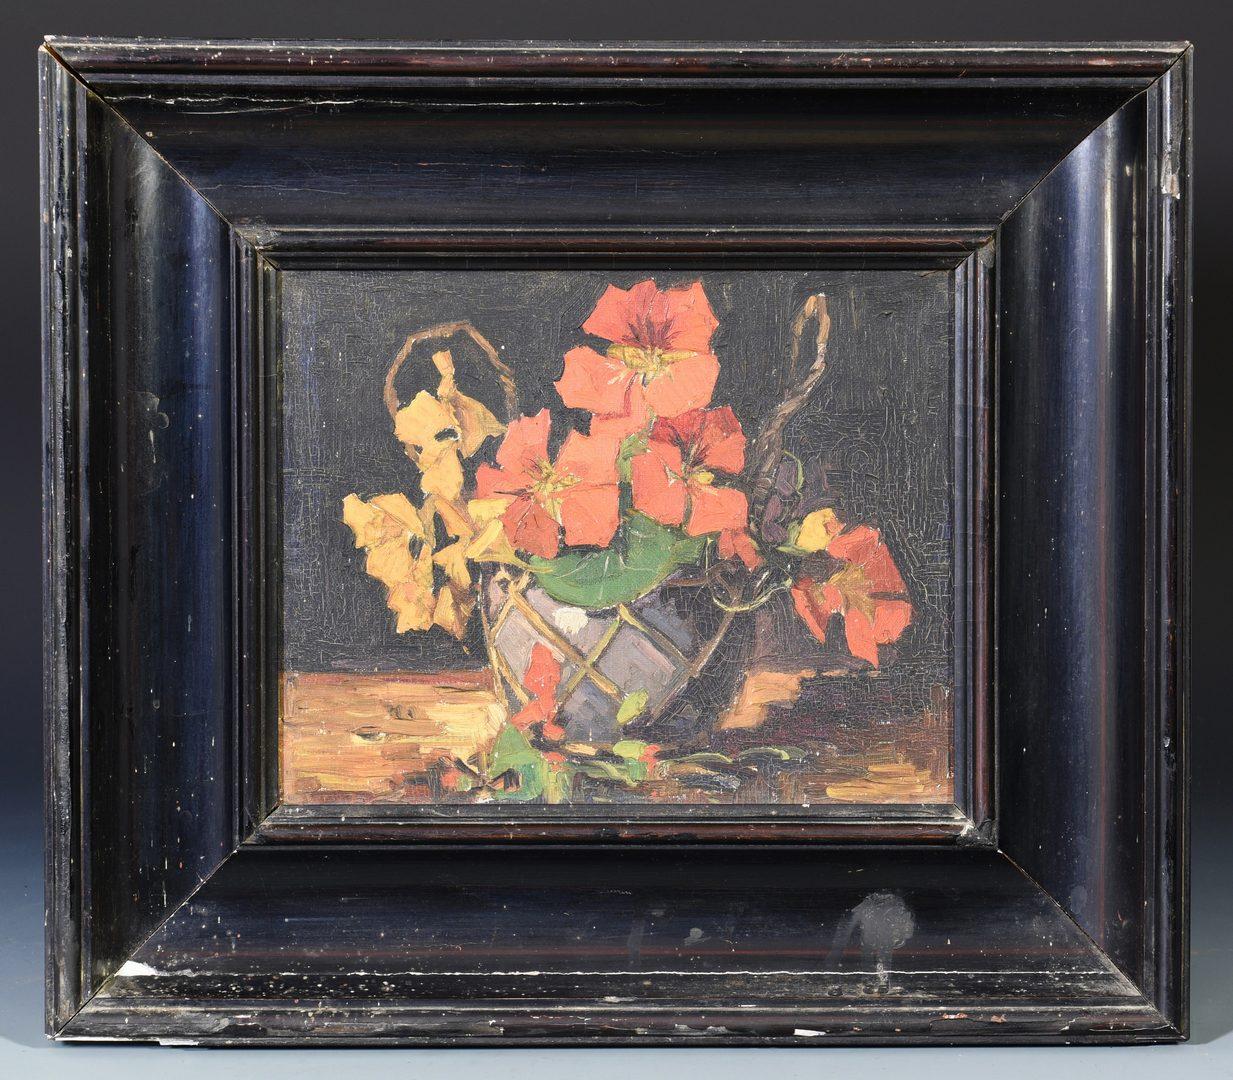 Lot 659: Impressionistic Still Life of Flowers